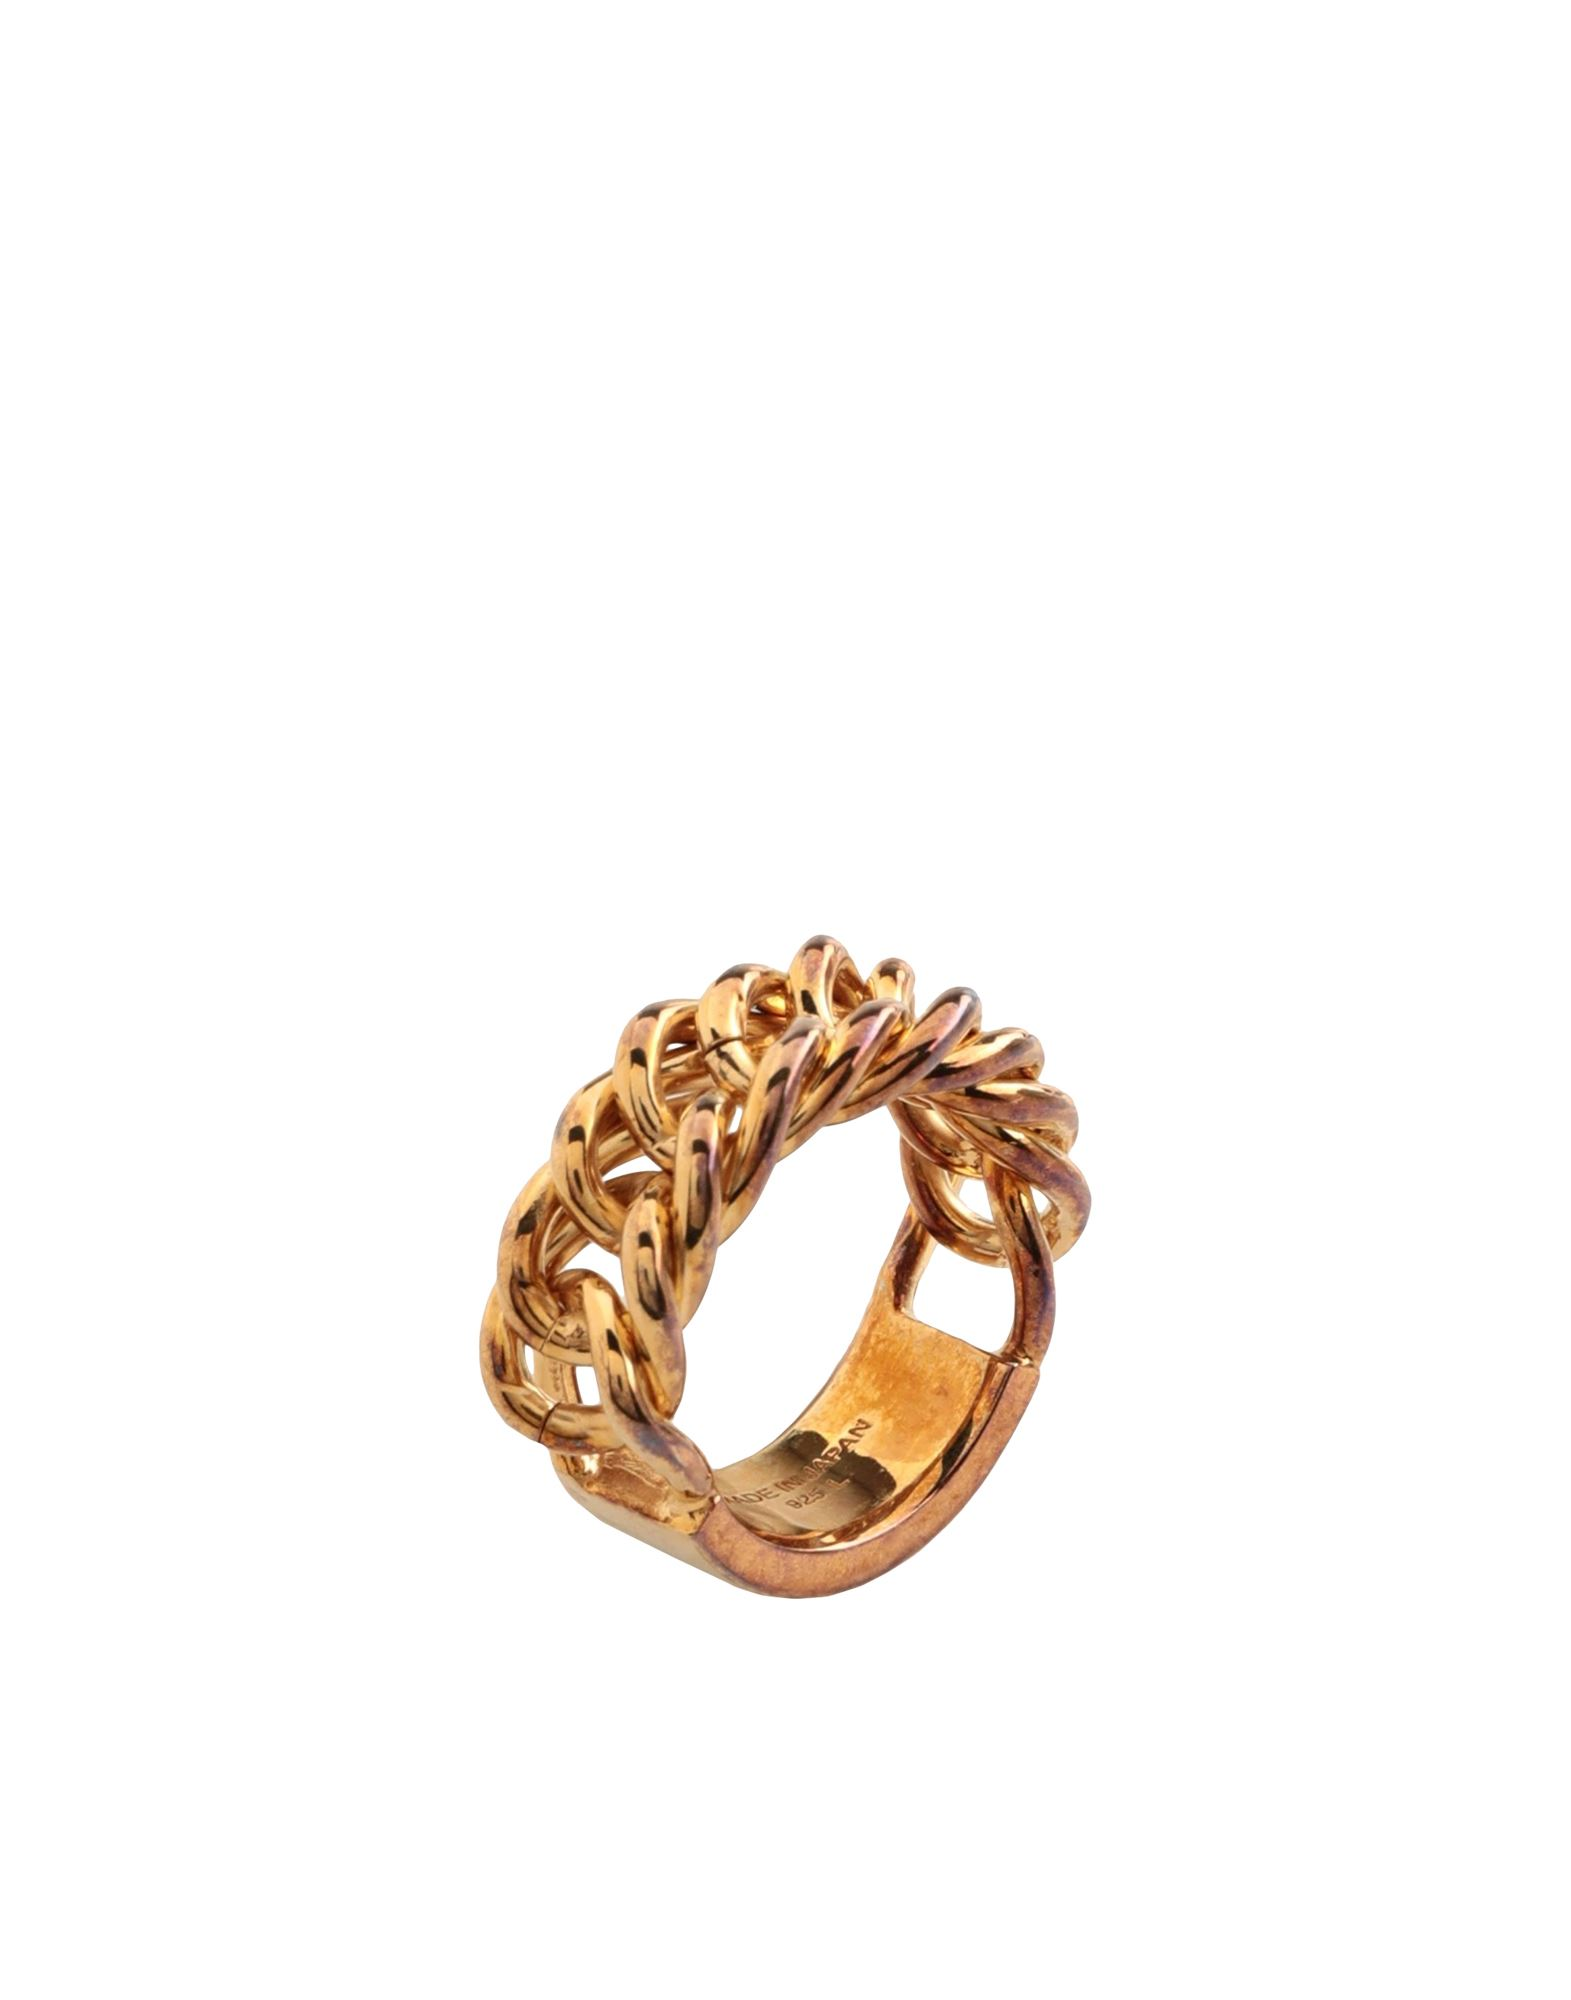 AMBUSH アンブッシュ メンズ 指輪 ブロンズ